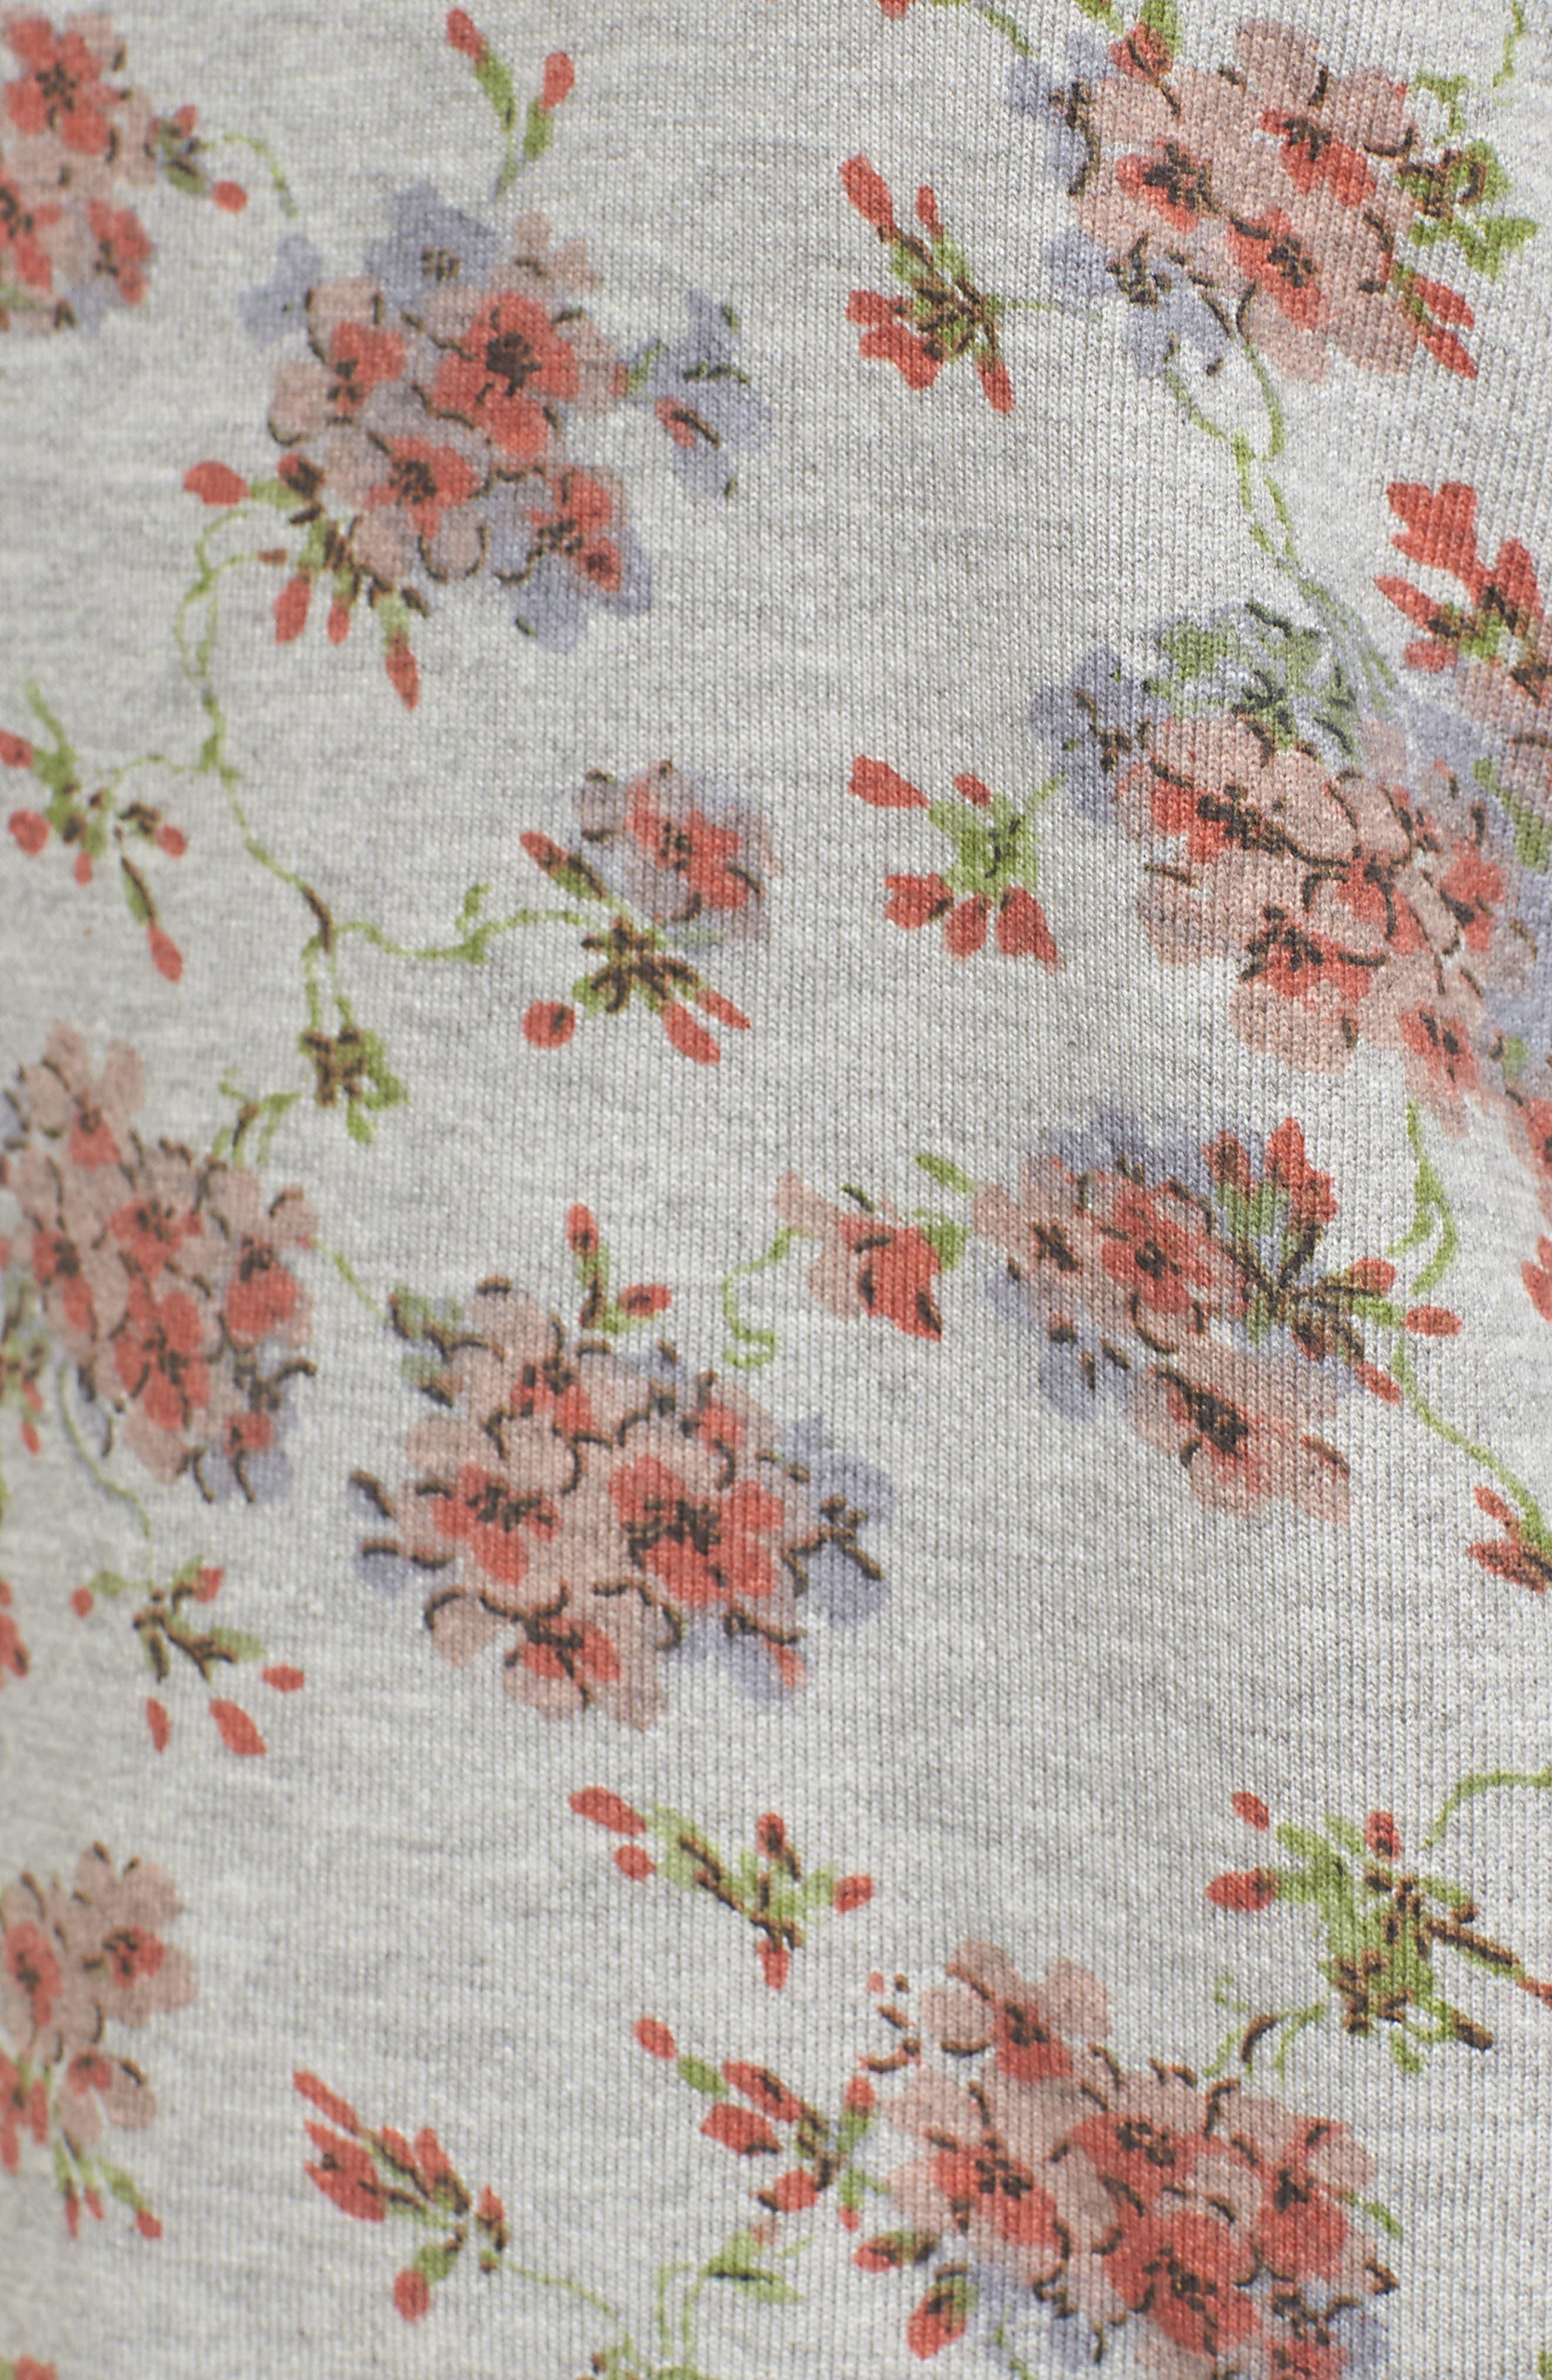 Poplin Cuff Sweatshirt,                             Alternate thumbnail 6, color,                             Grey Blush Floral W/ White